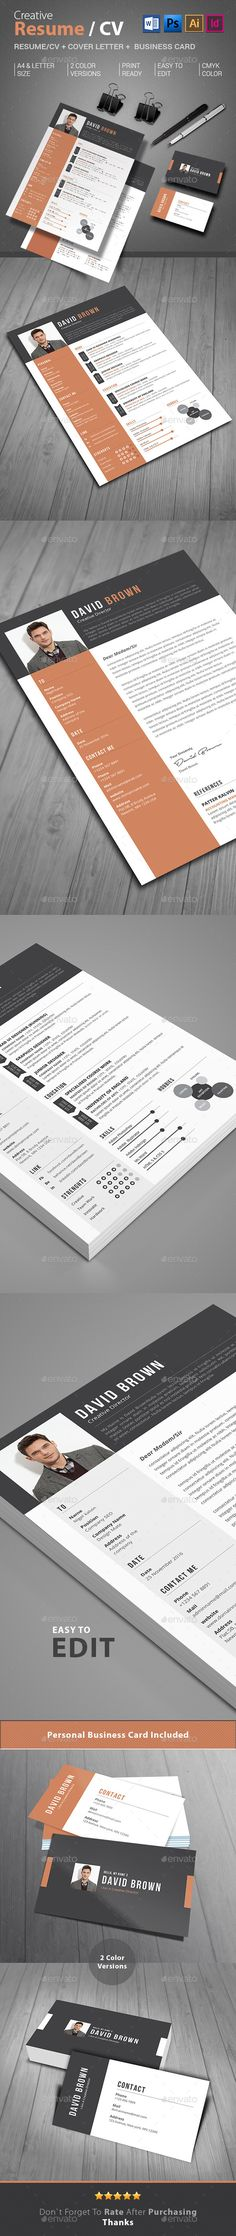 Professional Cv Docx In Microsoft Word Format Cv Cvdesign